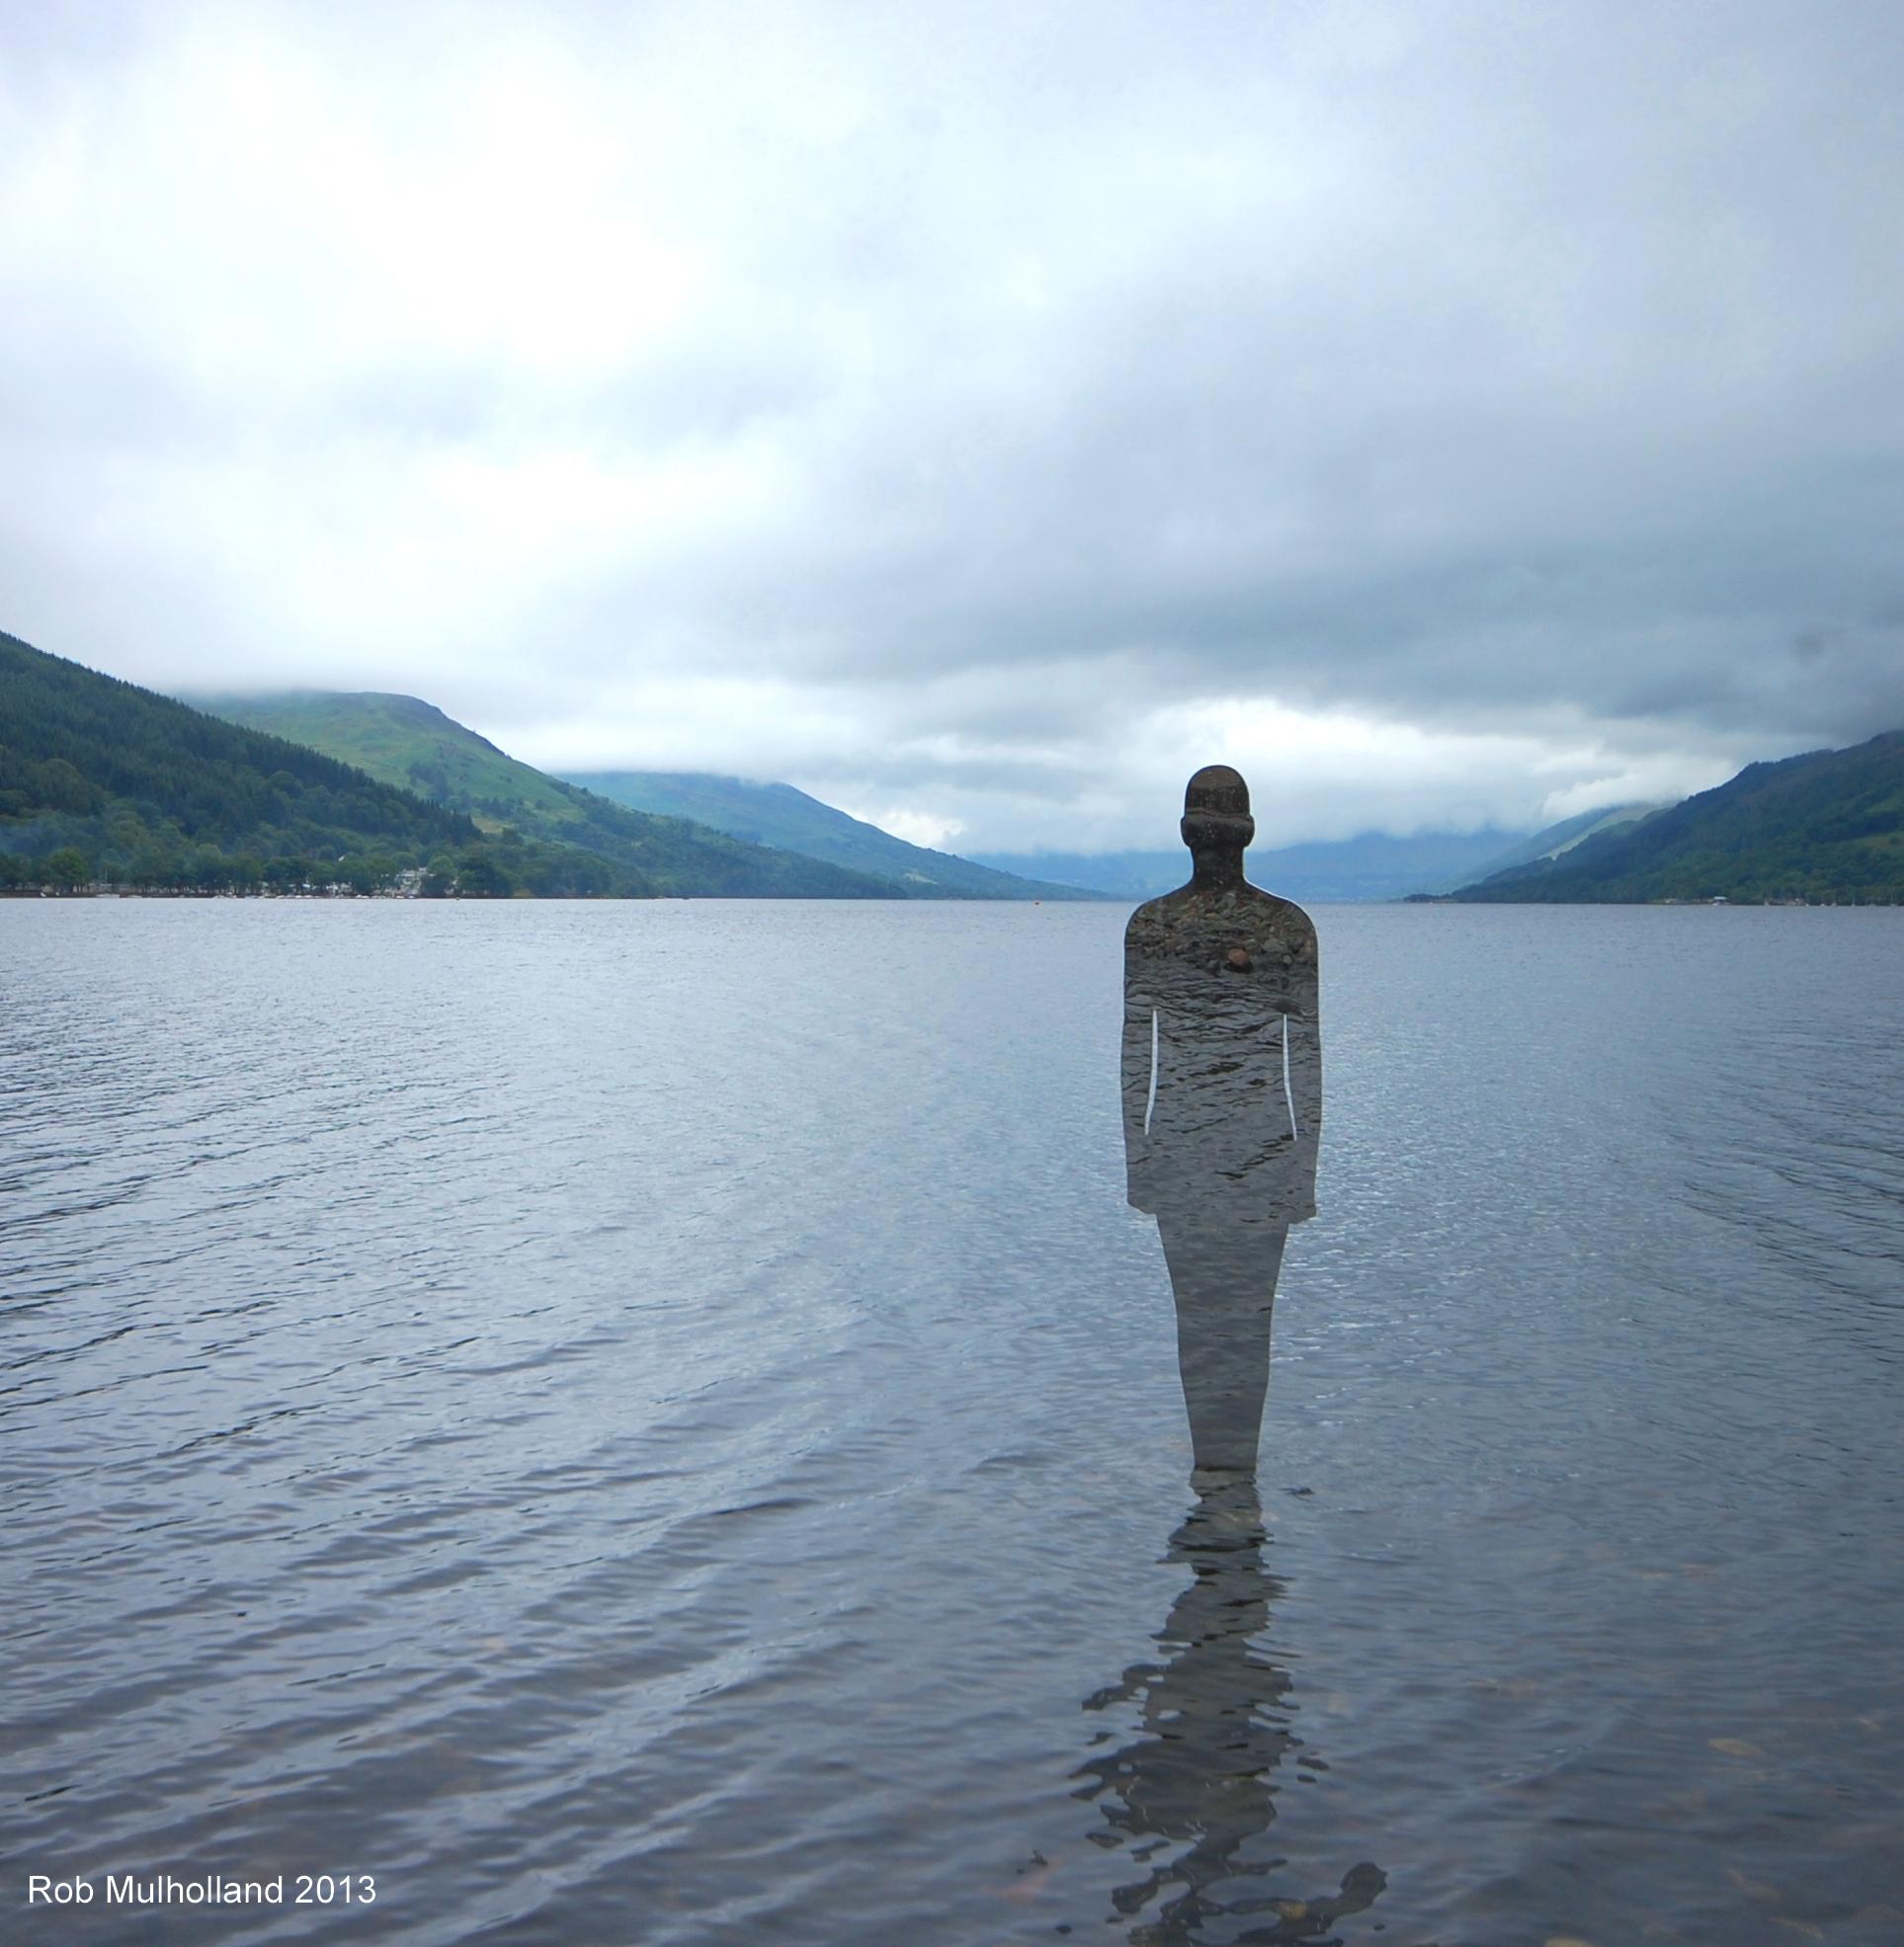 Unique art installation makes waves on Loch Earn ...